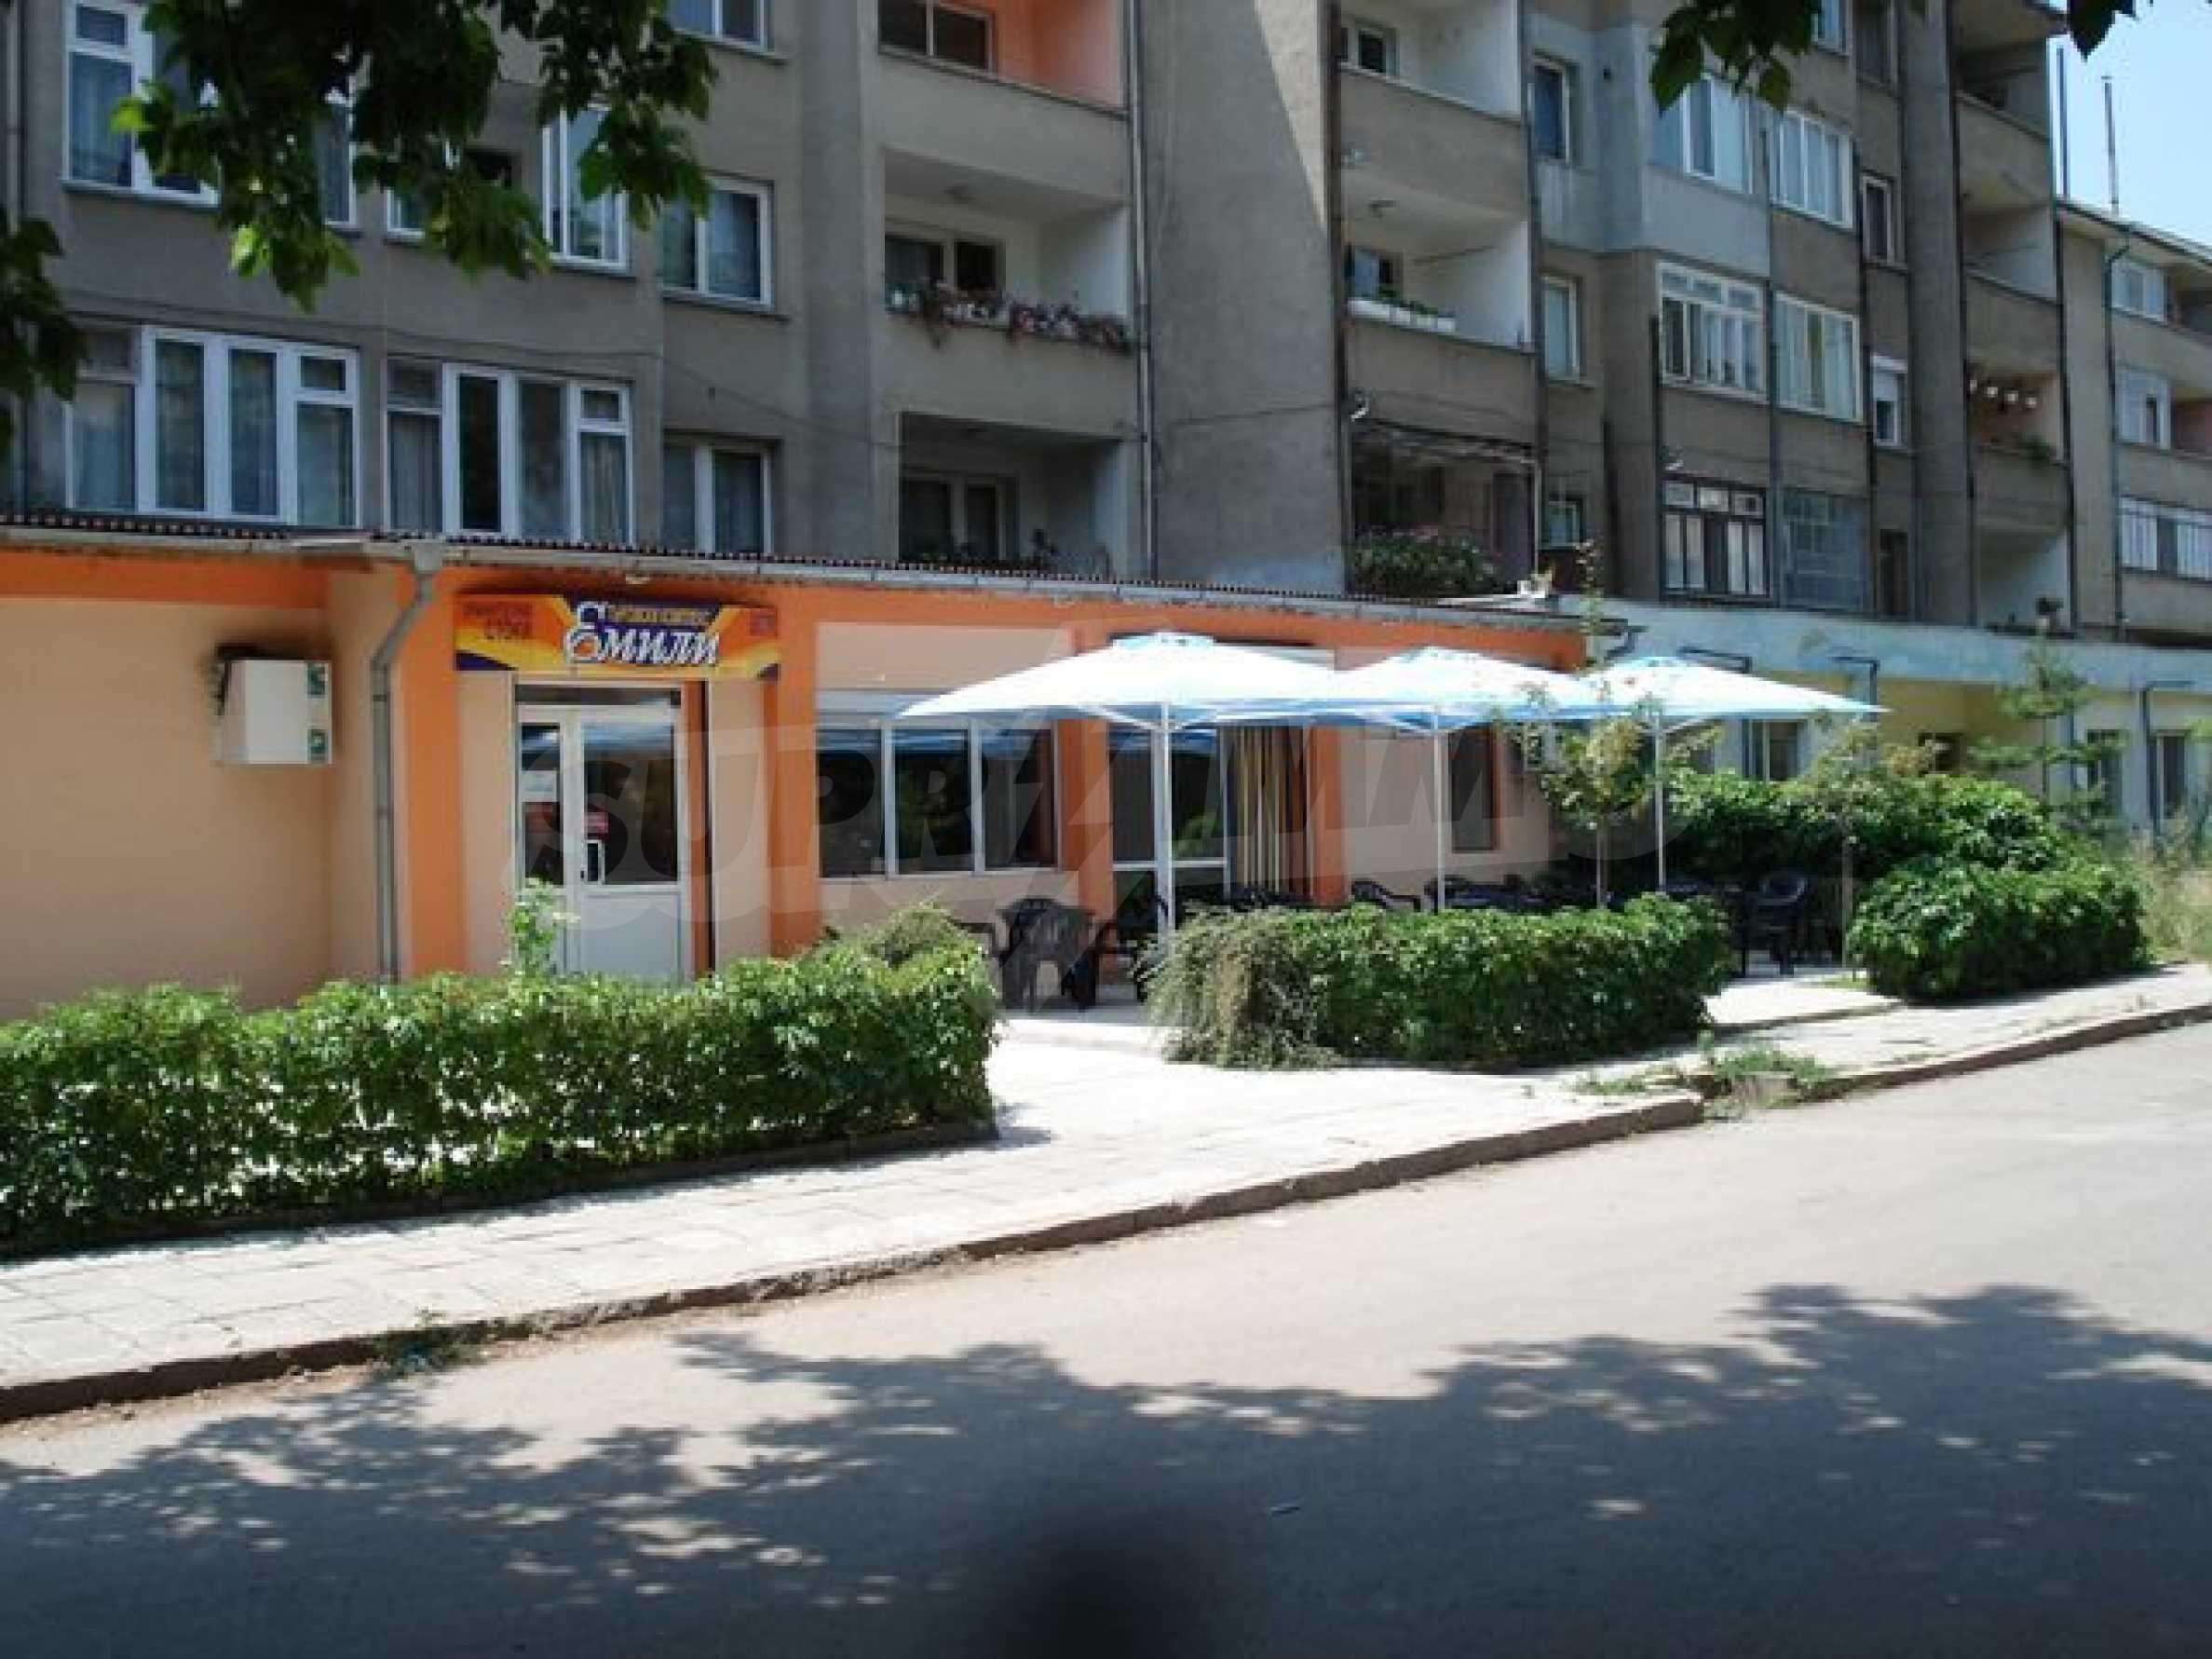 Food shop and bistro in Vidin